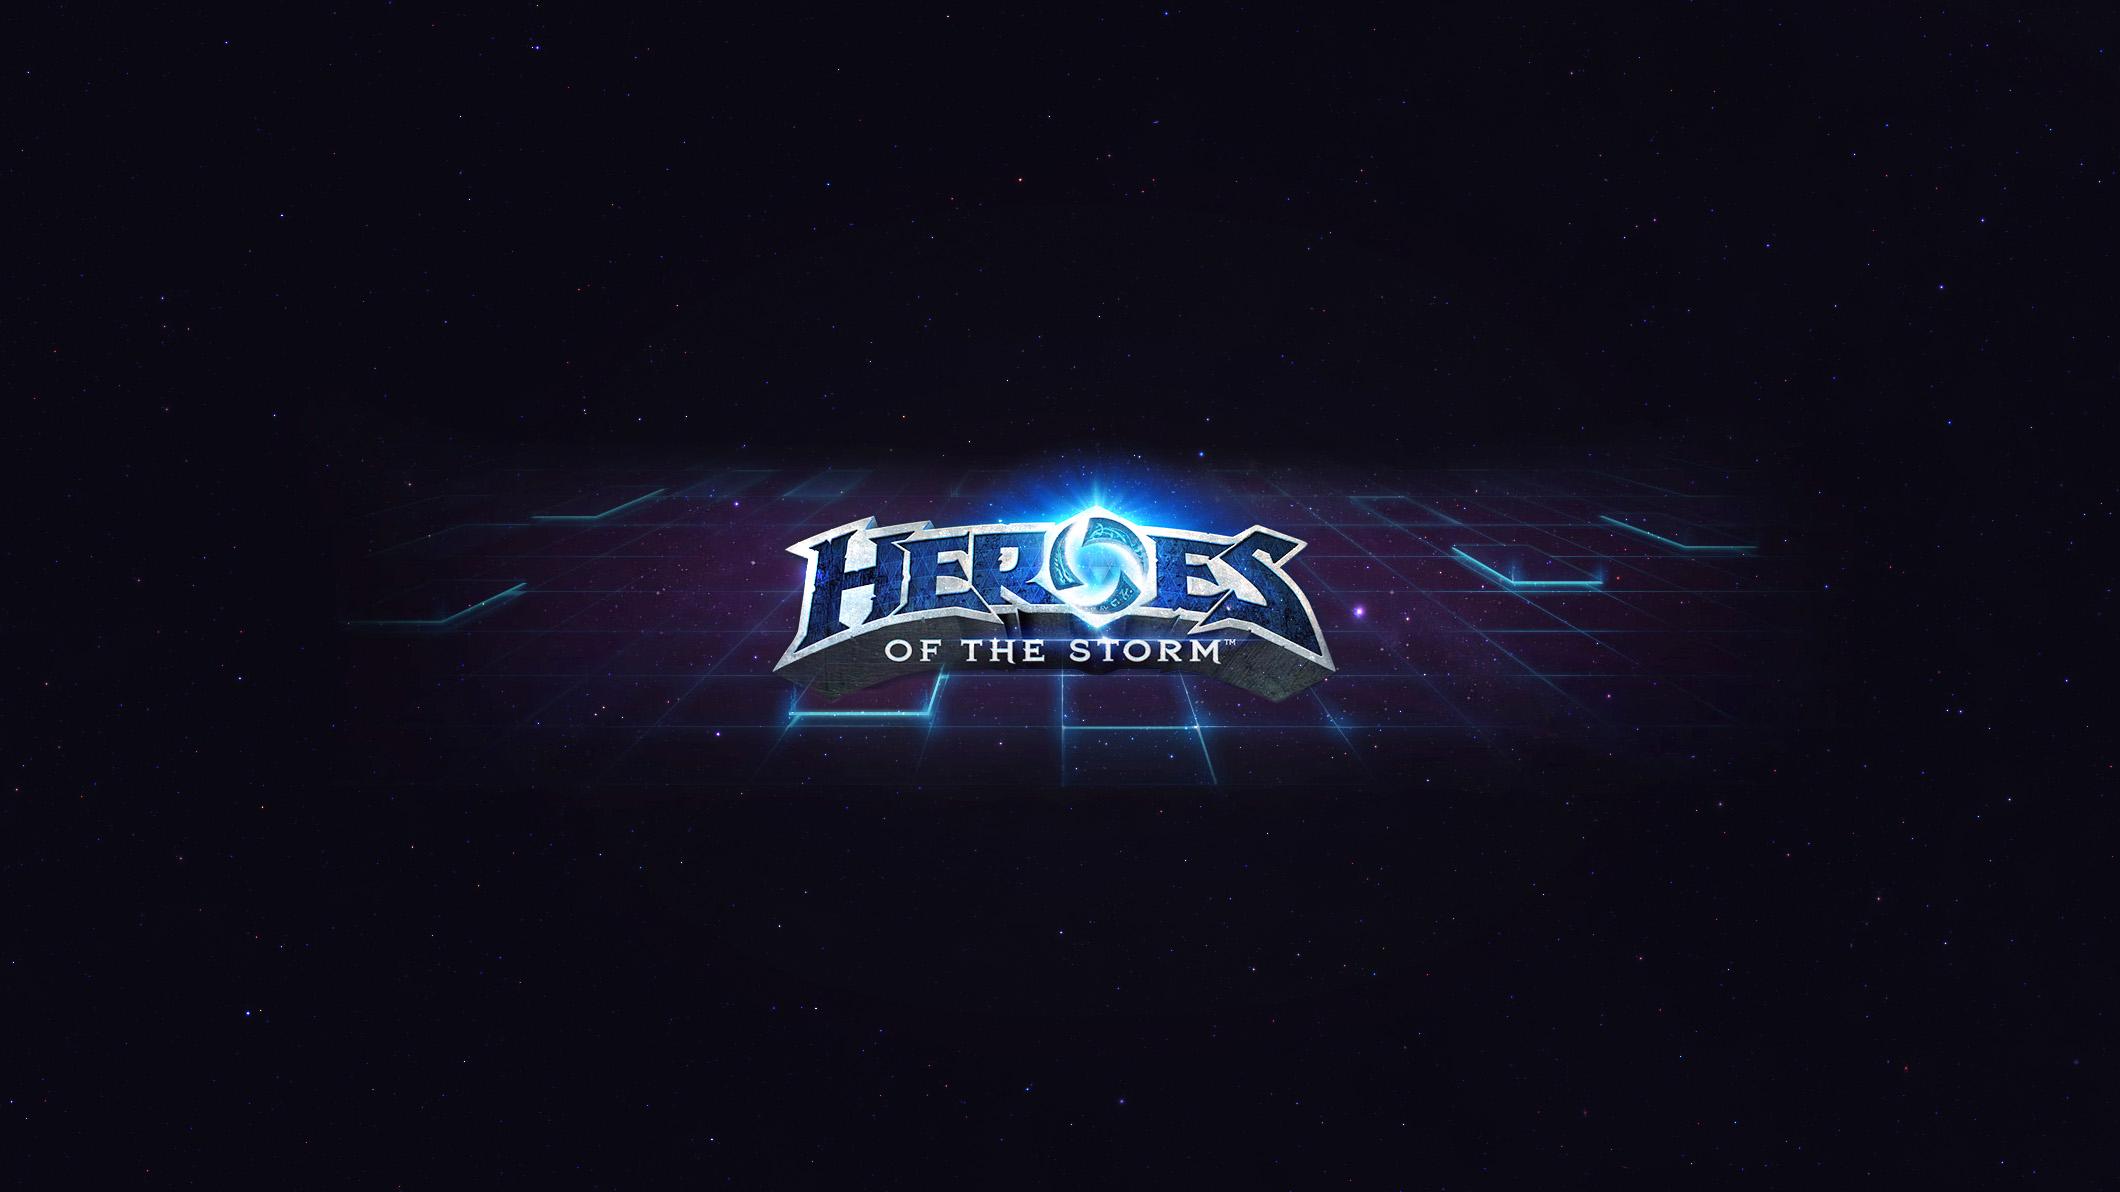 Heroes Of The Storm Wallpaper 4 Wallpapersbq